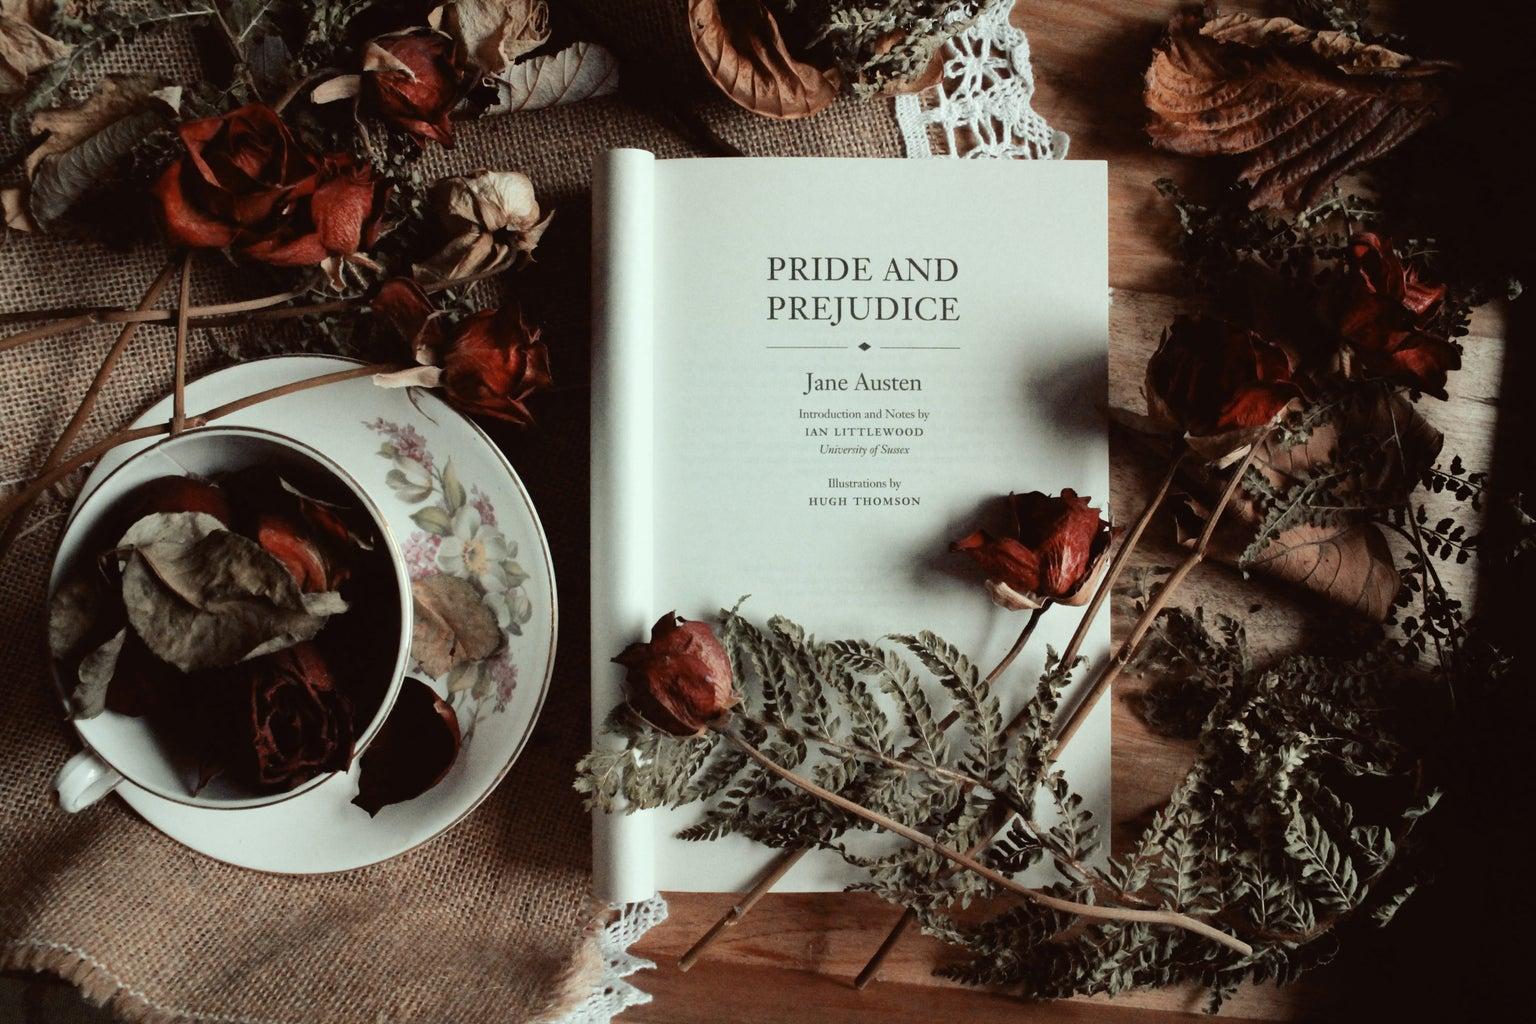 Pride and Prejudice, Jane Austen, book, flowers, roses